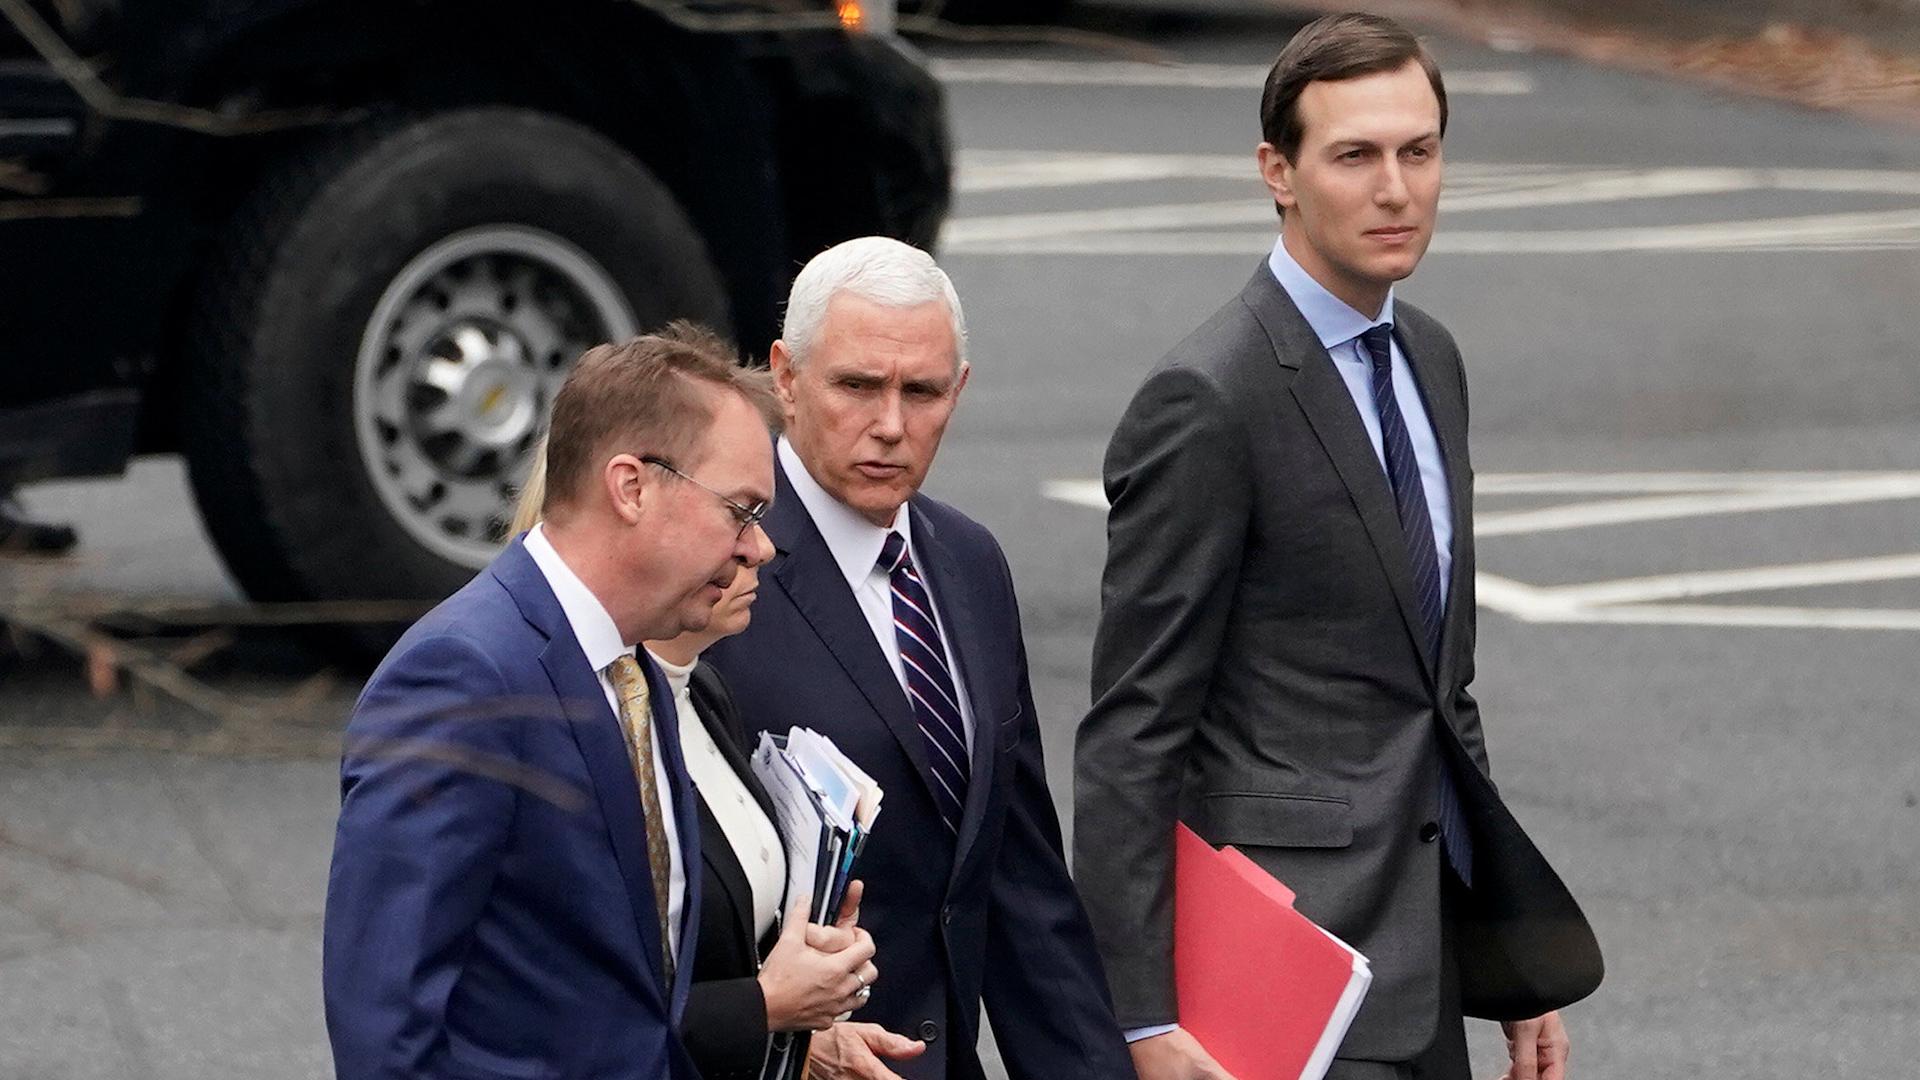 'Master negotiator' or 'nonentity'? Kushner thrusts himself into middle of shutdown talks.